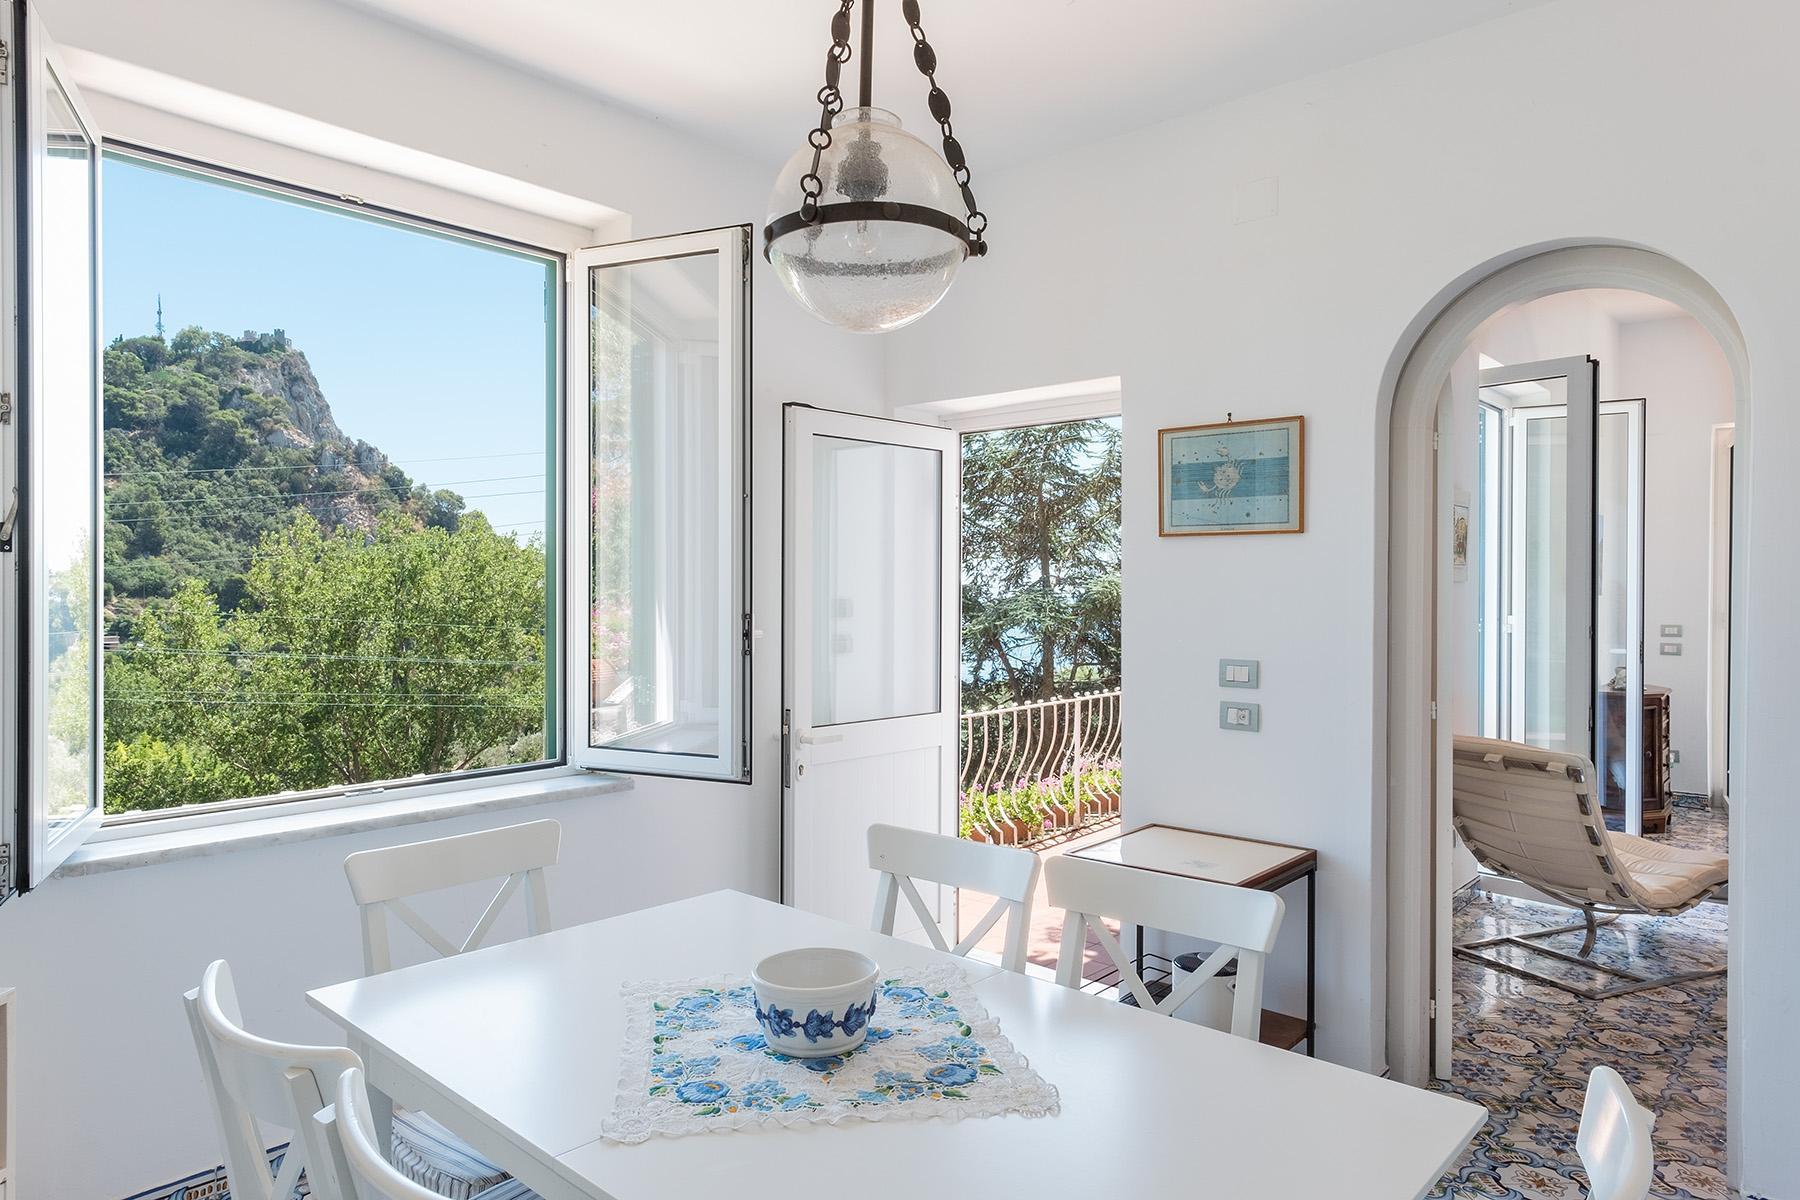 Прекрасная вилла с панорамным видом на море в центре легендарного острова Капри, Италия - 5